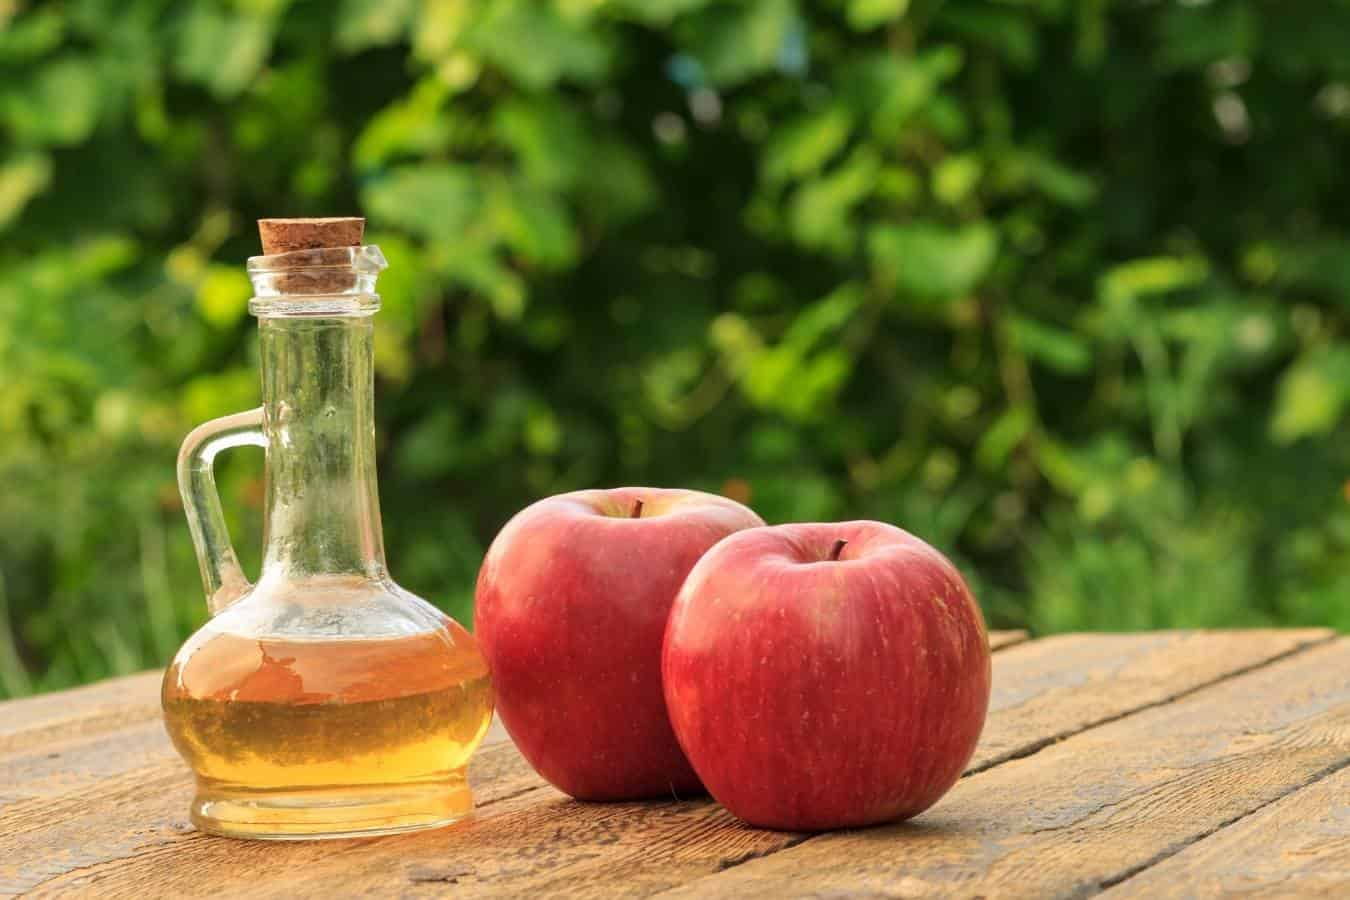 How Often Should You Use Apple Cider Vinegar On Gray Hair